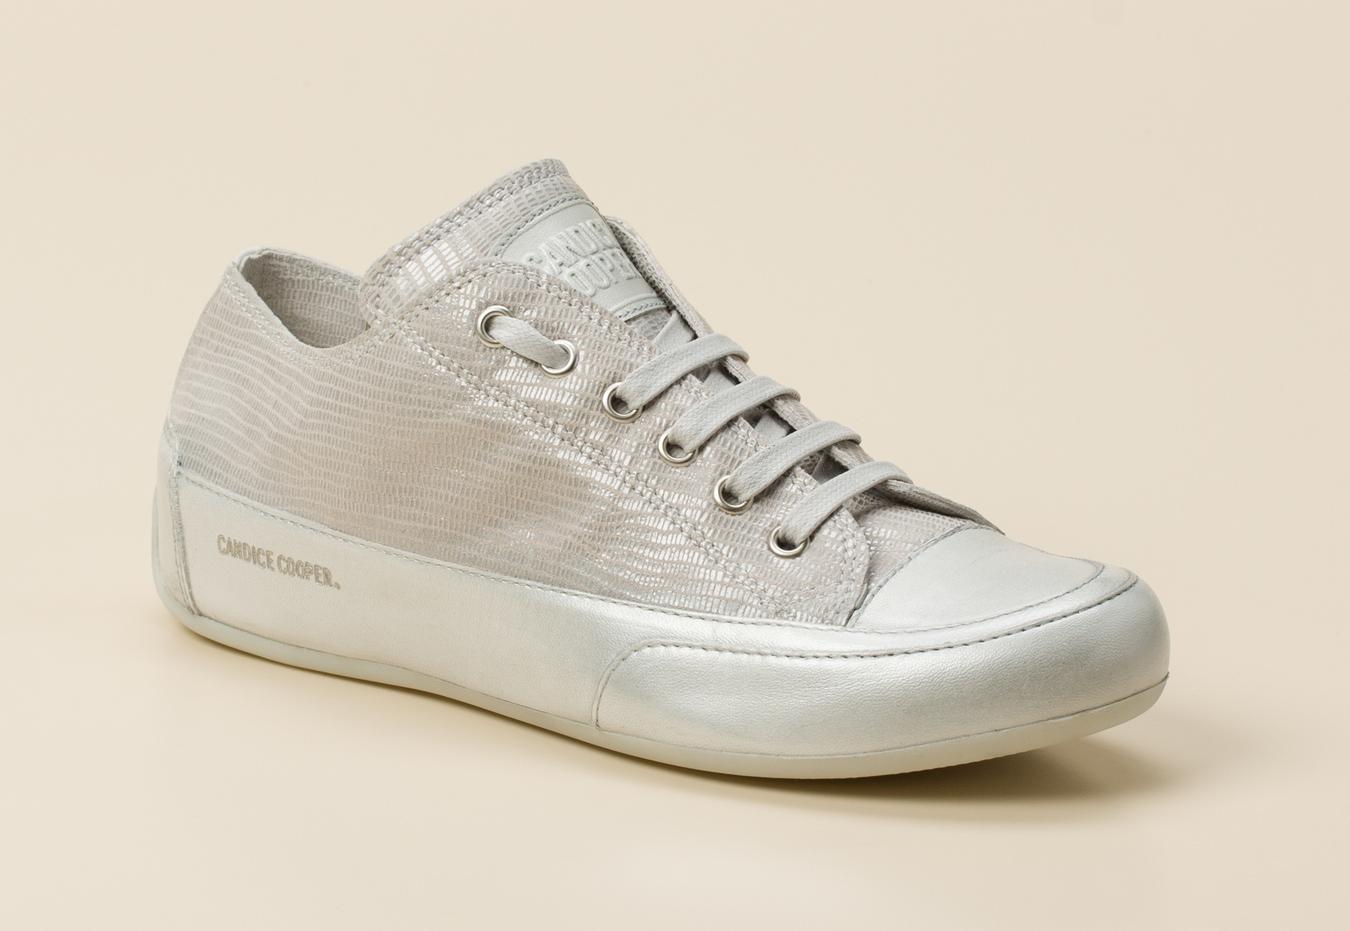 37cffba0c45440 Candice Cooper Damen Sneaker in silber kaufen